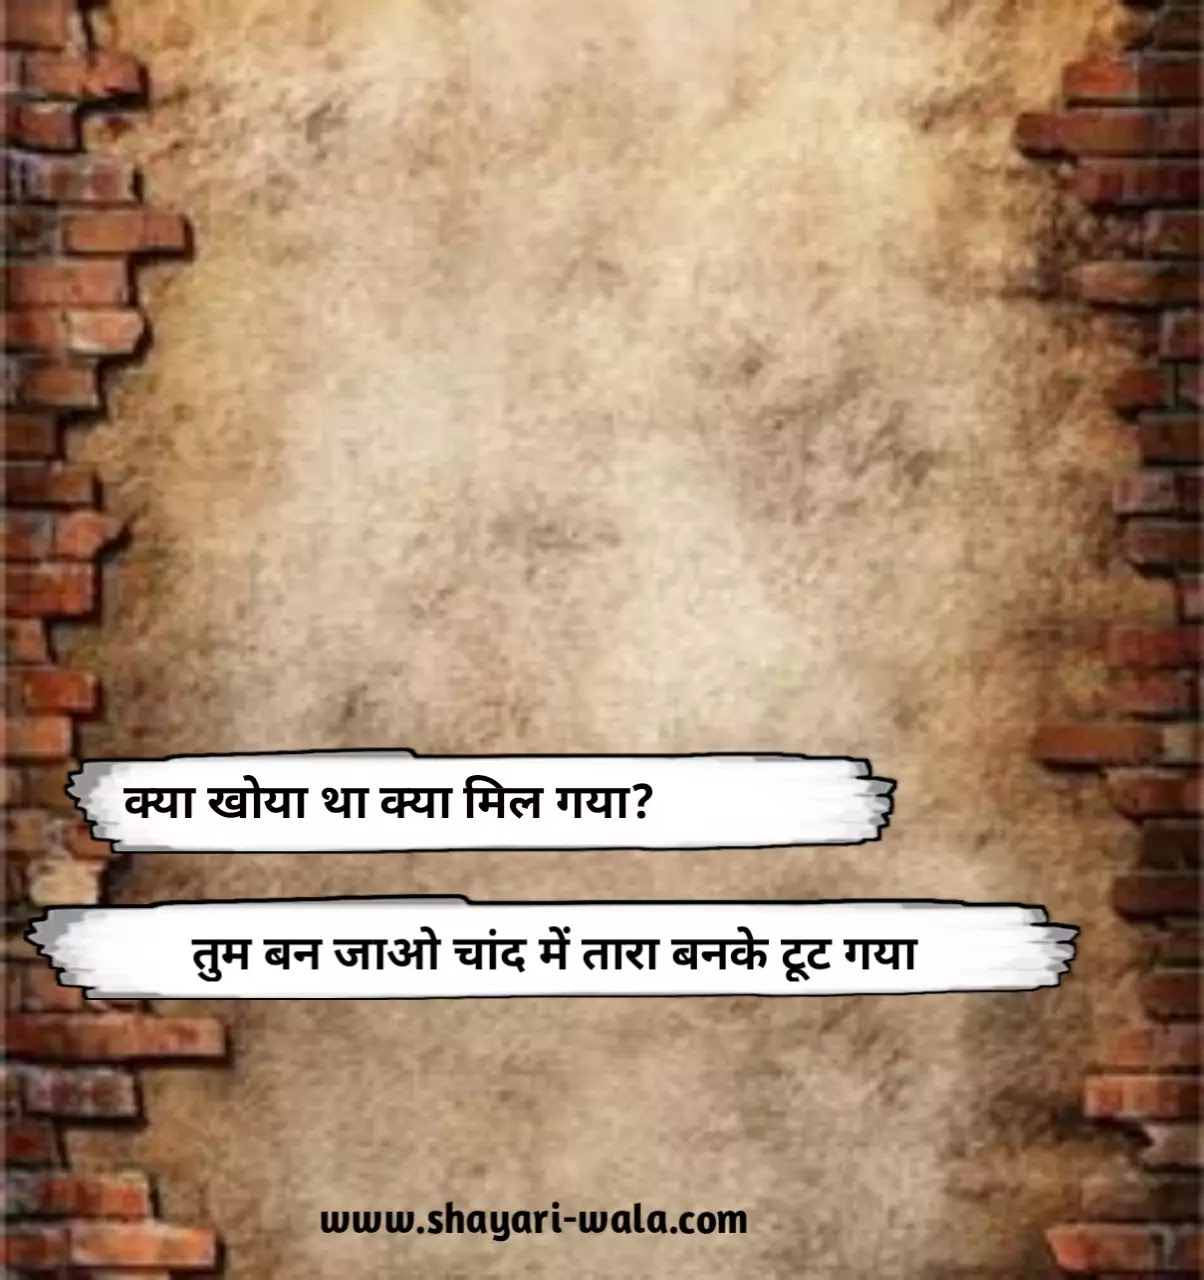 Breakup shayri, sad shayri images | shayarikingdom.com